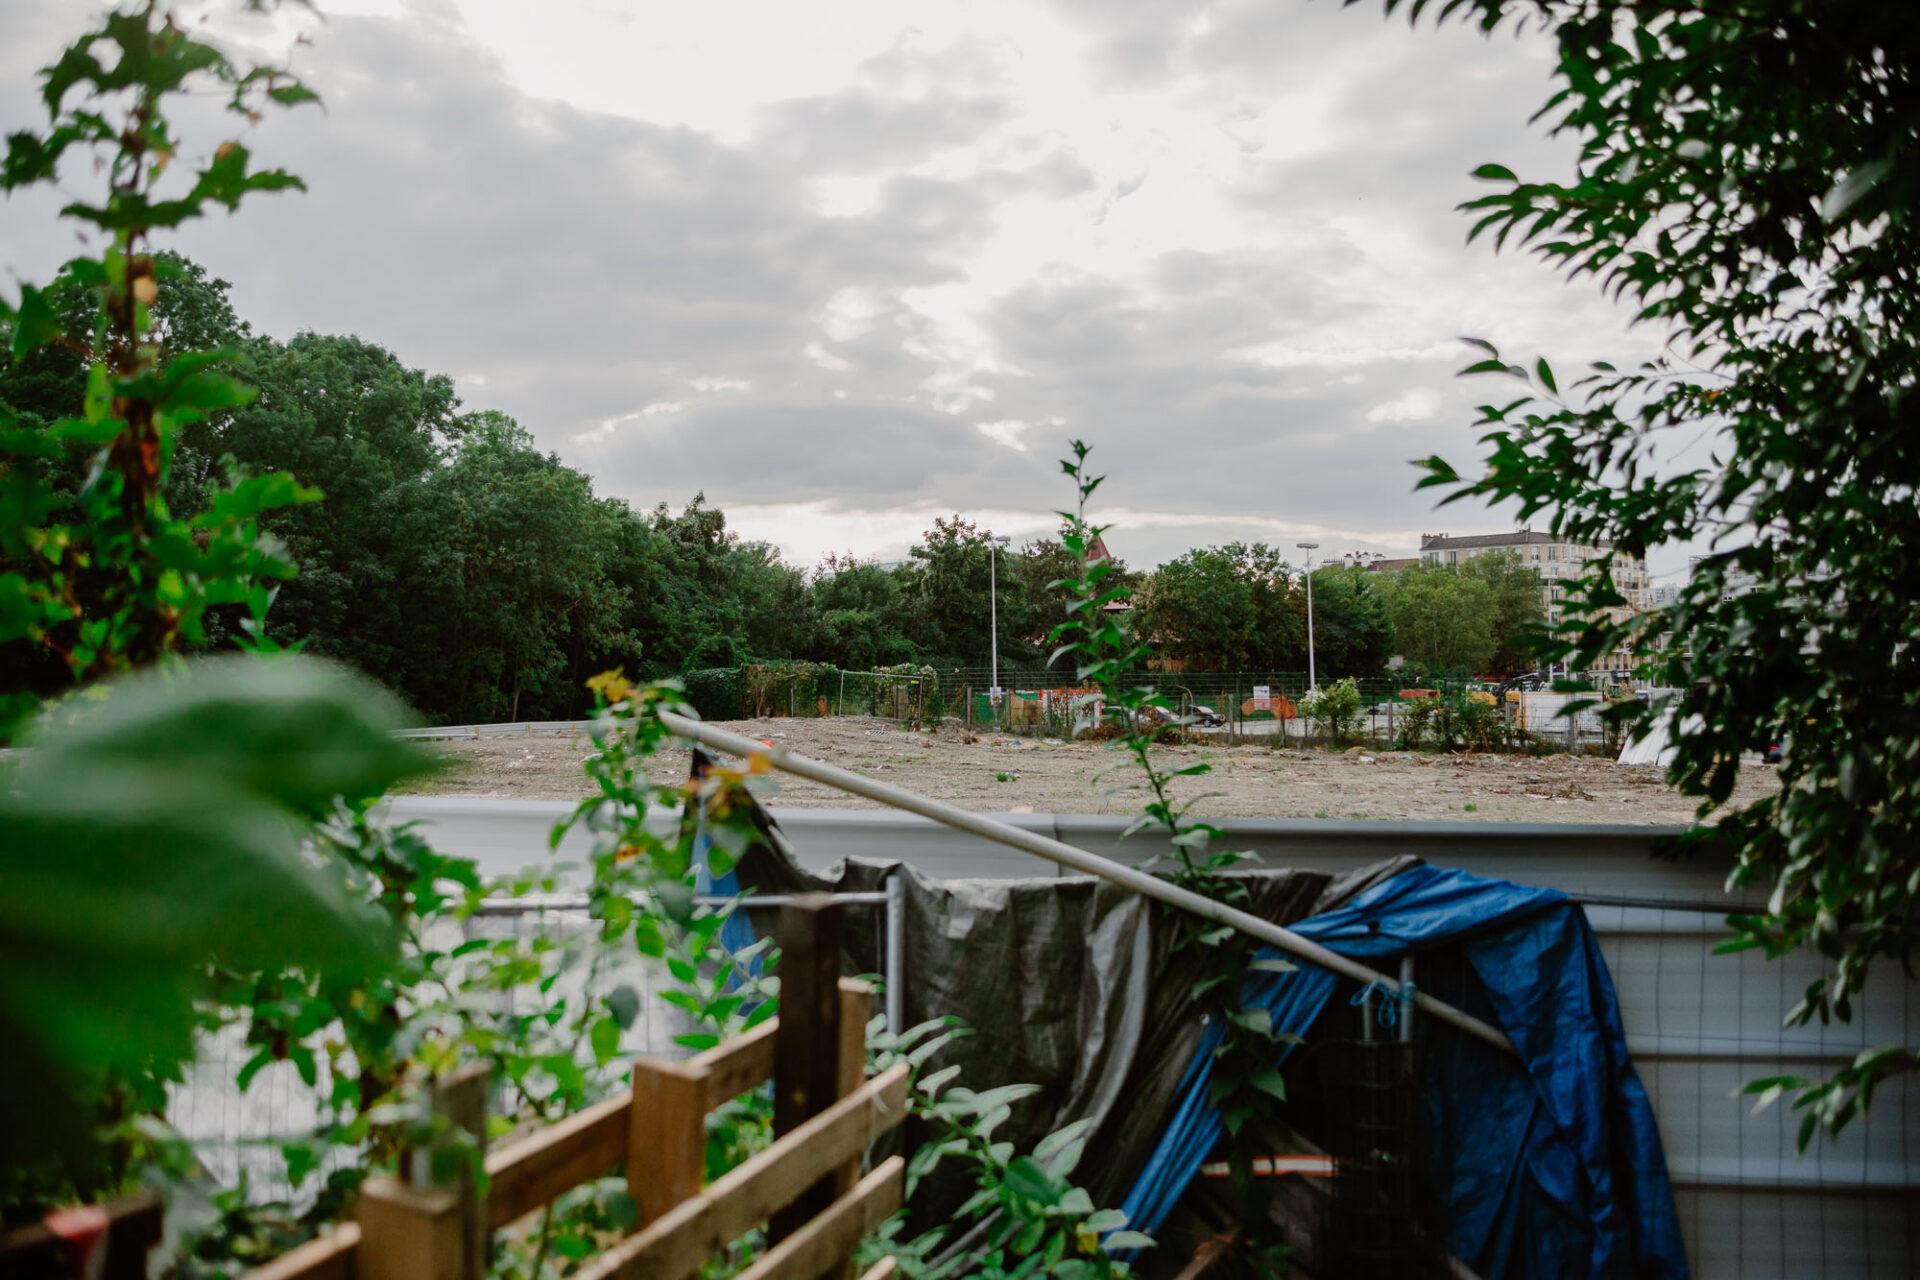 Jardins ouvriers aubervilliers 20 - Dagmara Bojenko - Eco-conscious Weddings, Births & Families